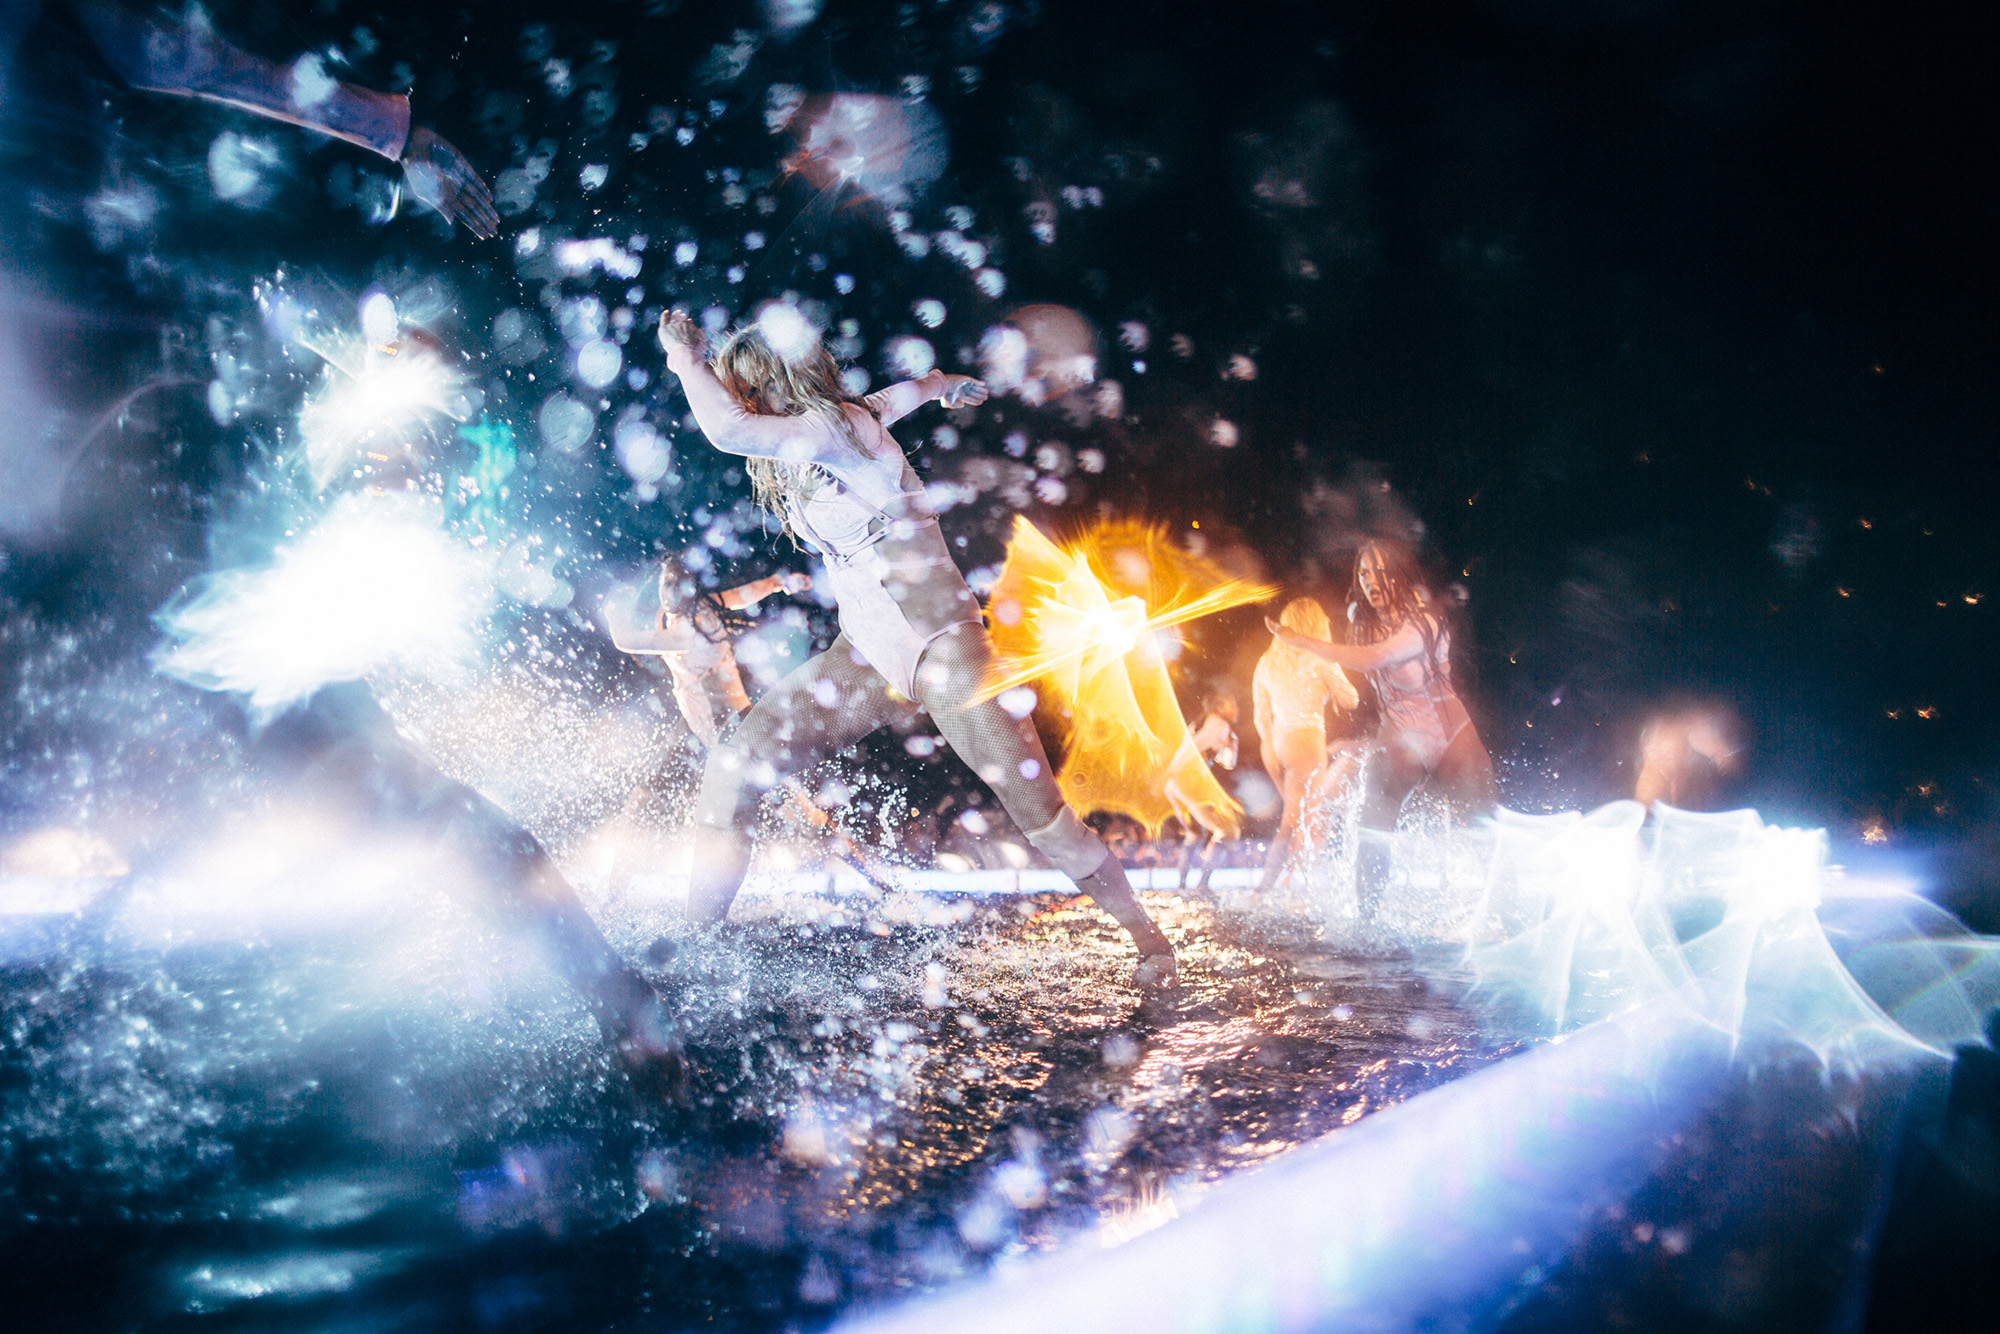 Dancers splash water onstage at Beyoncé's  Formation World Tour, 2016.